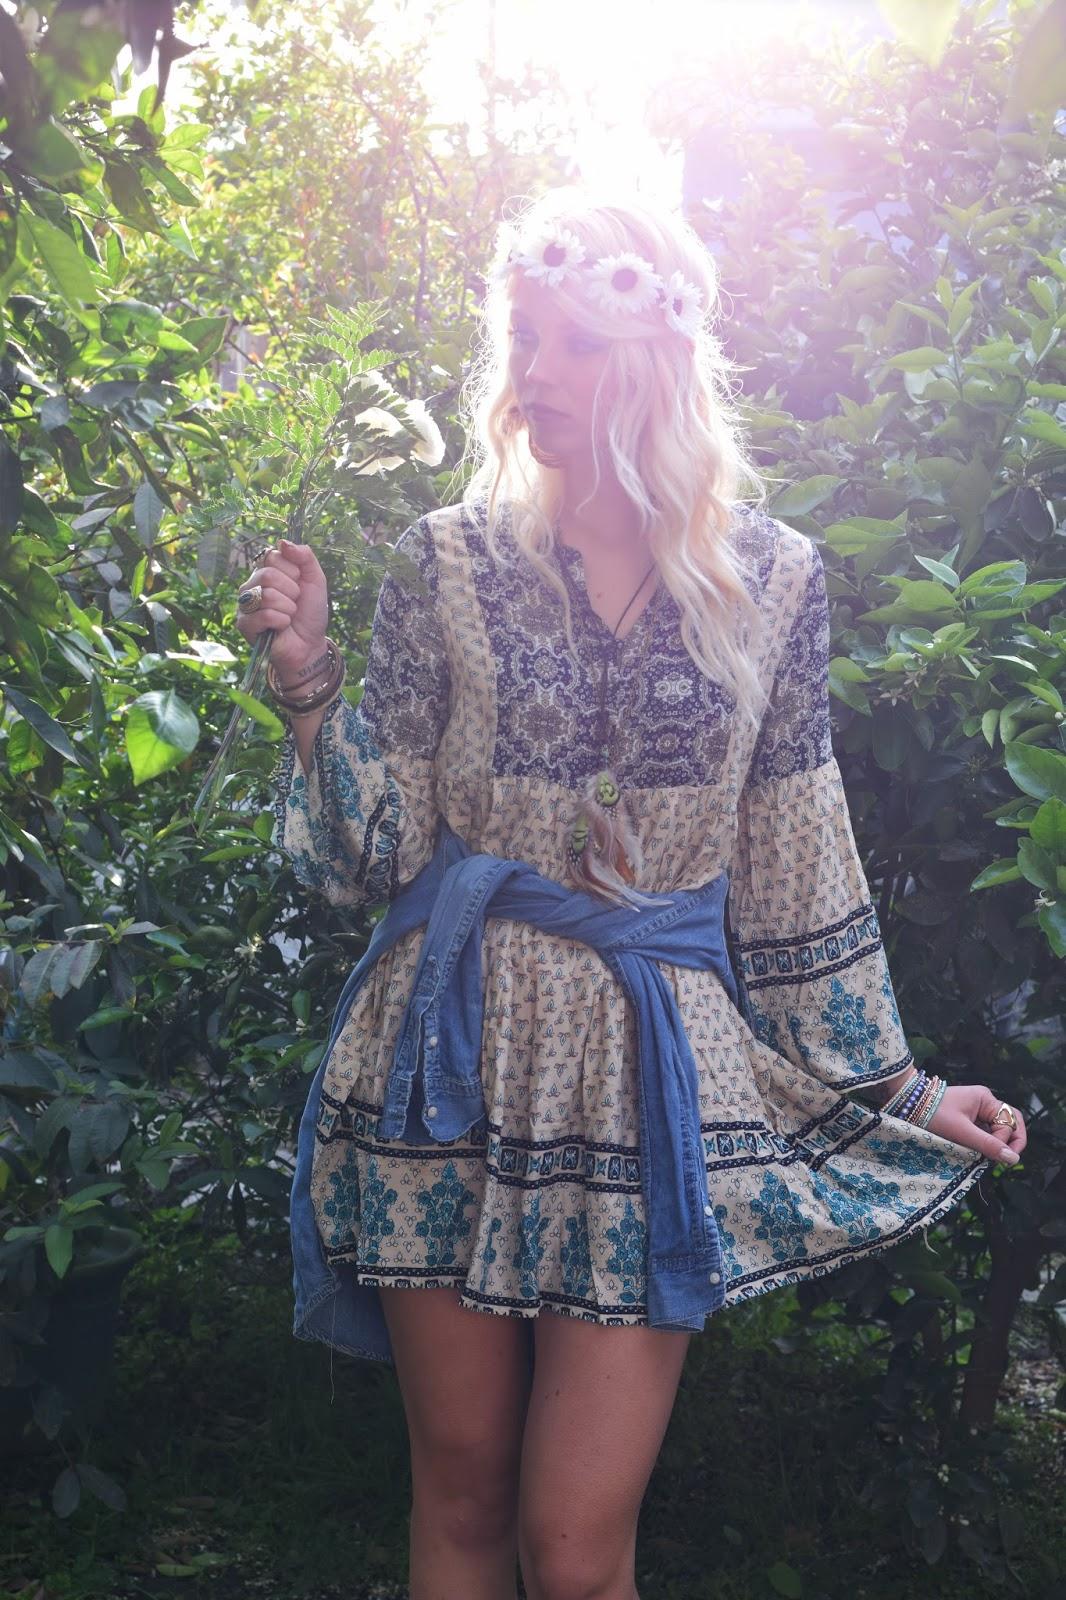 boho, coachella, festival, flower crown, bohemian, what to wear for coachella